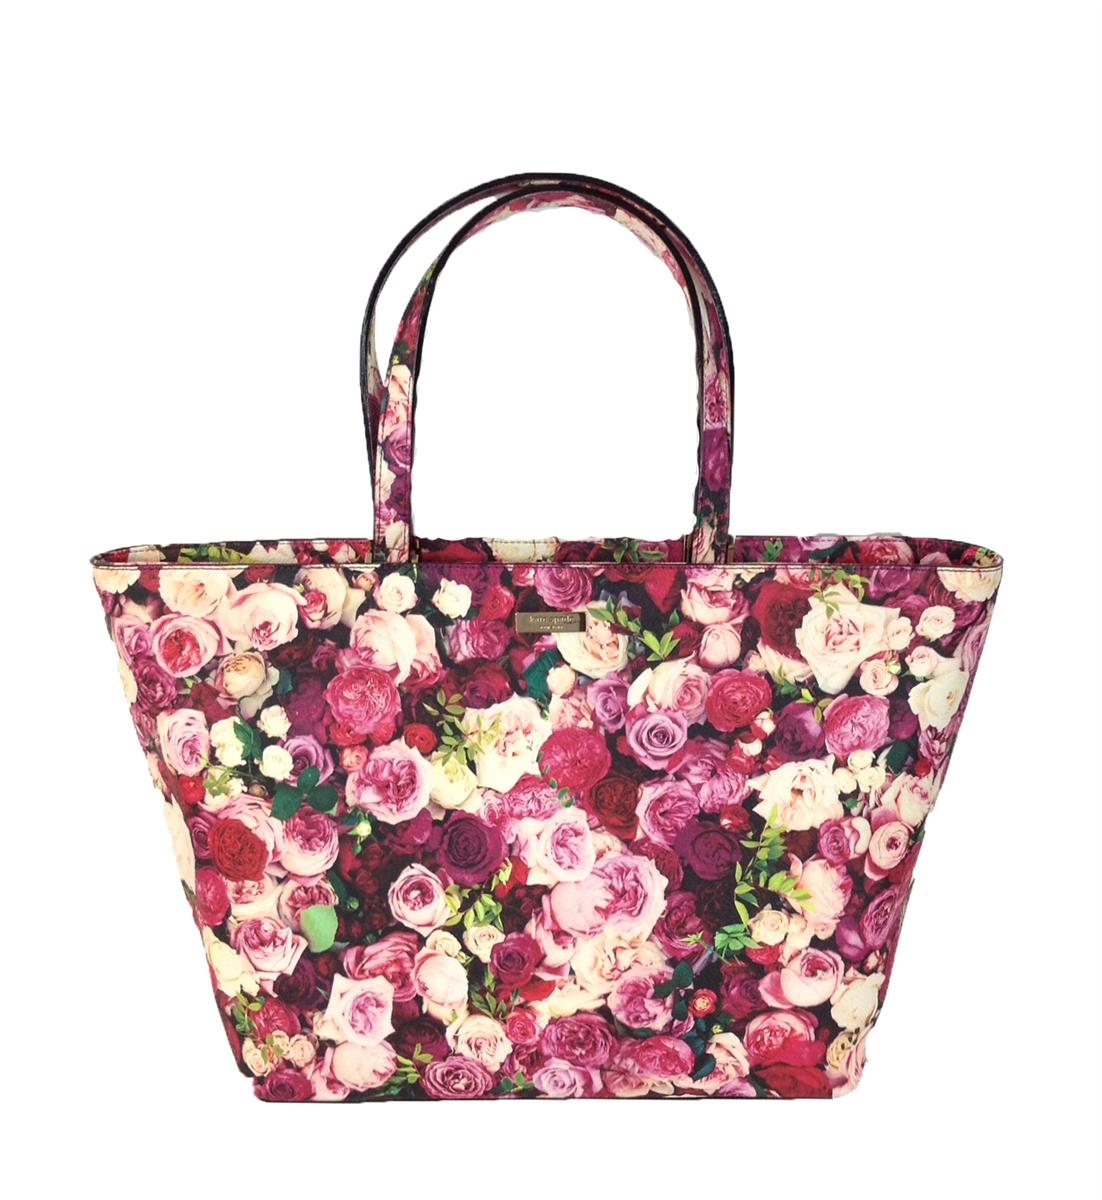 Kate Spade Grant Street Jules Floral Tote Bag, Photo Rose